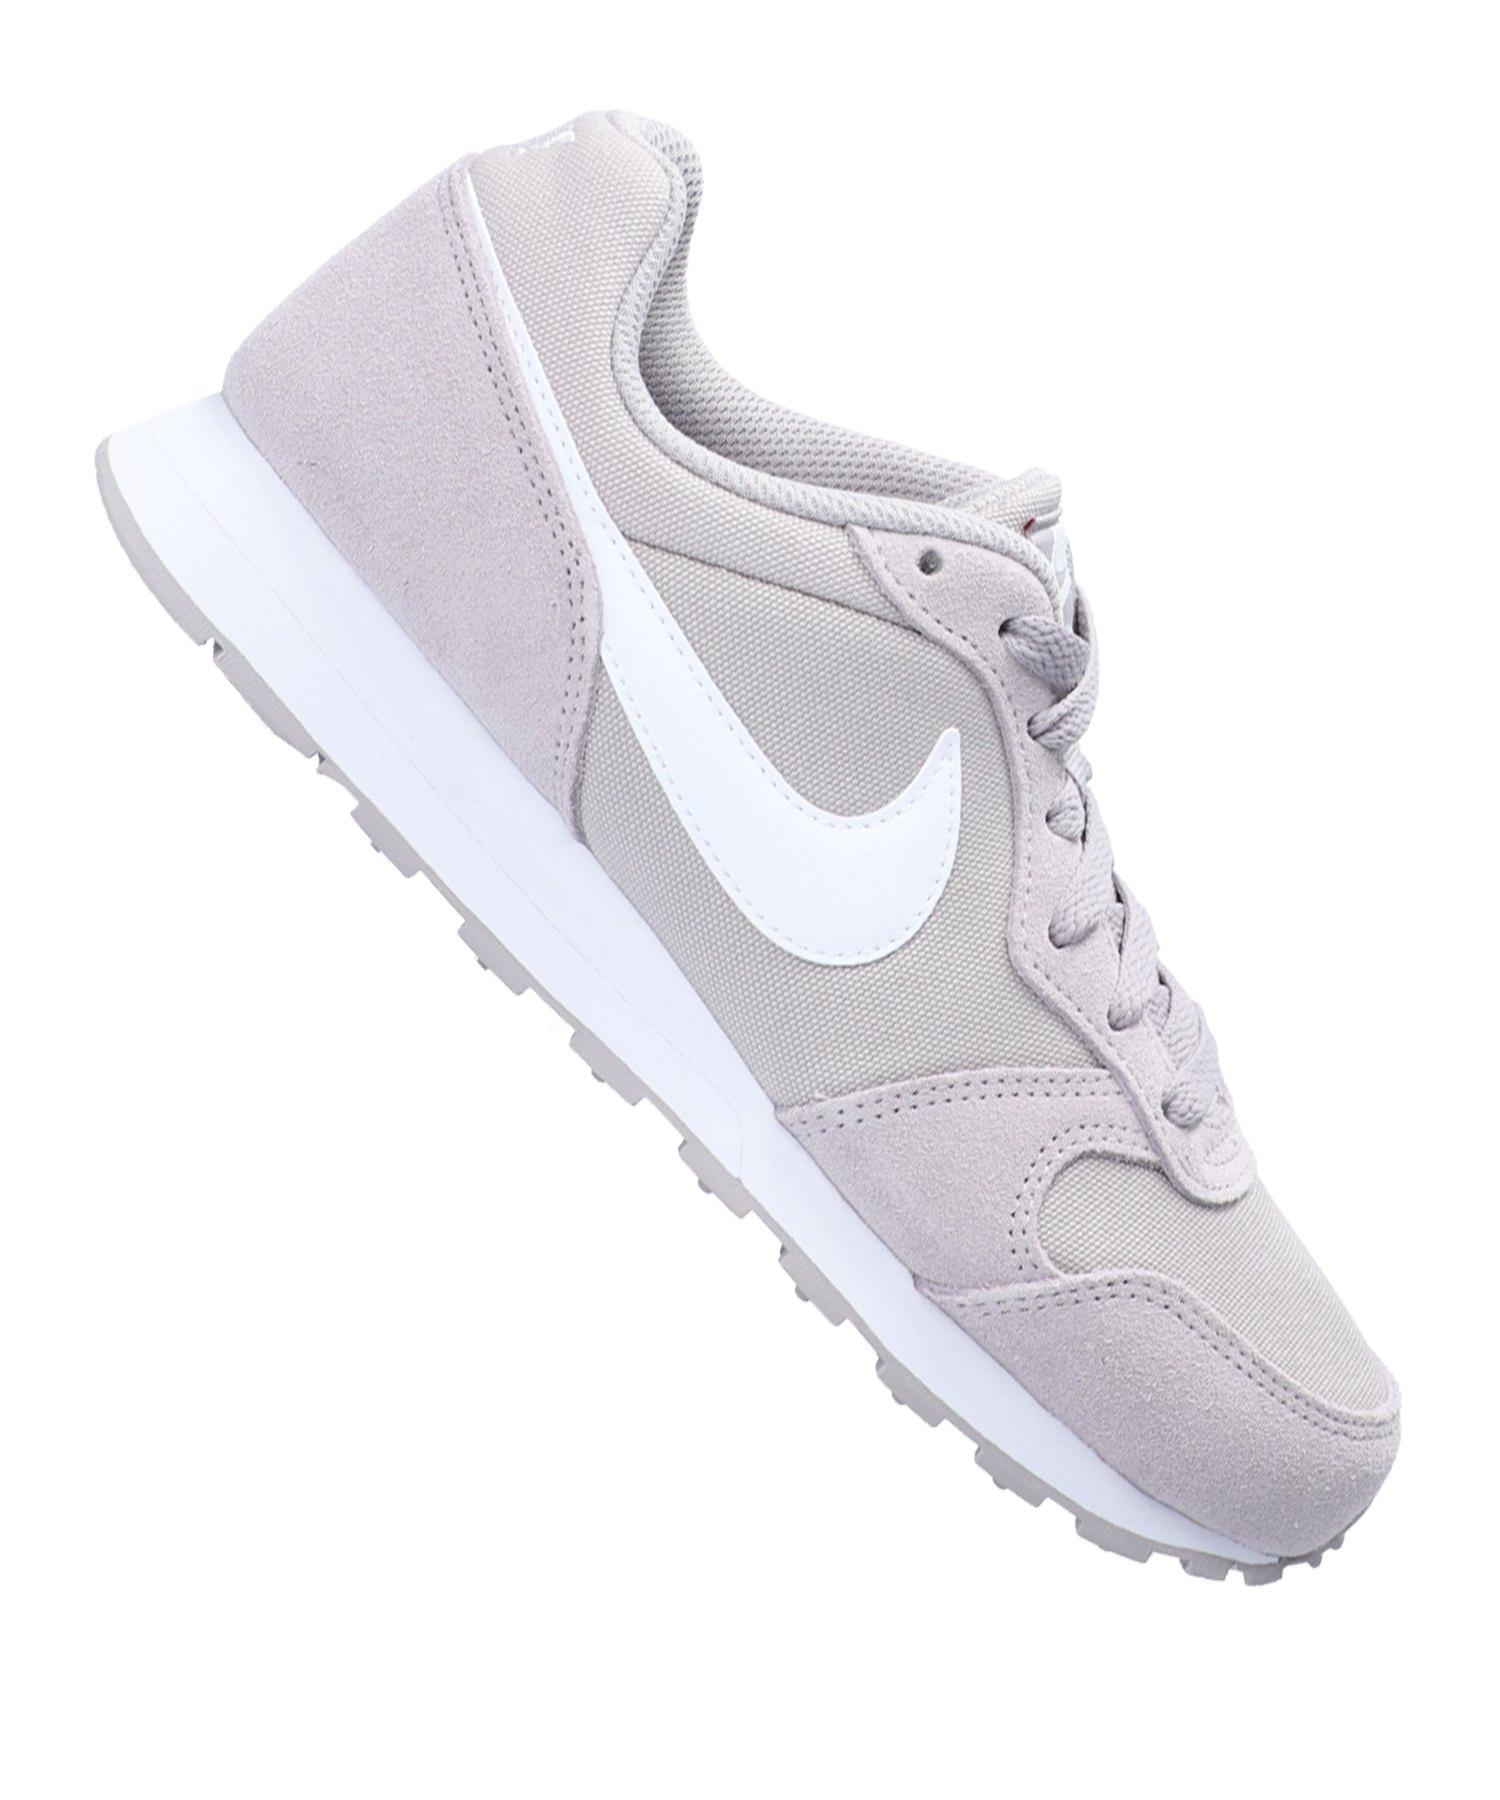 nike mercurial vapor xi hallenschuhe, Nike MD Runner 2